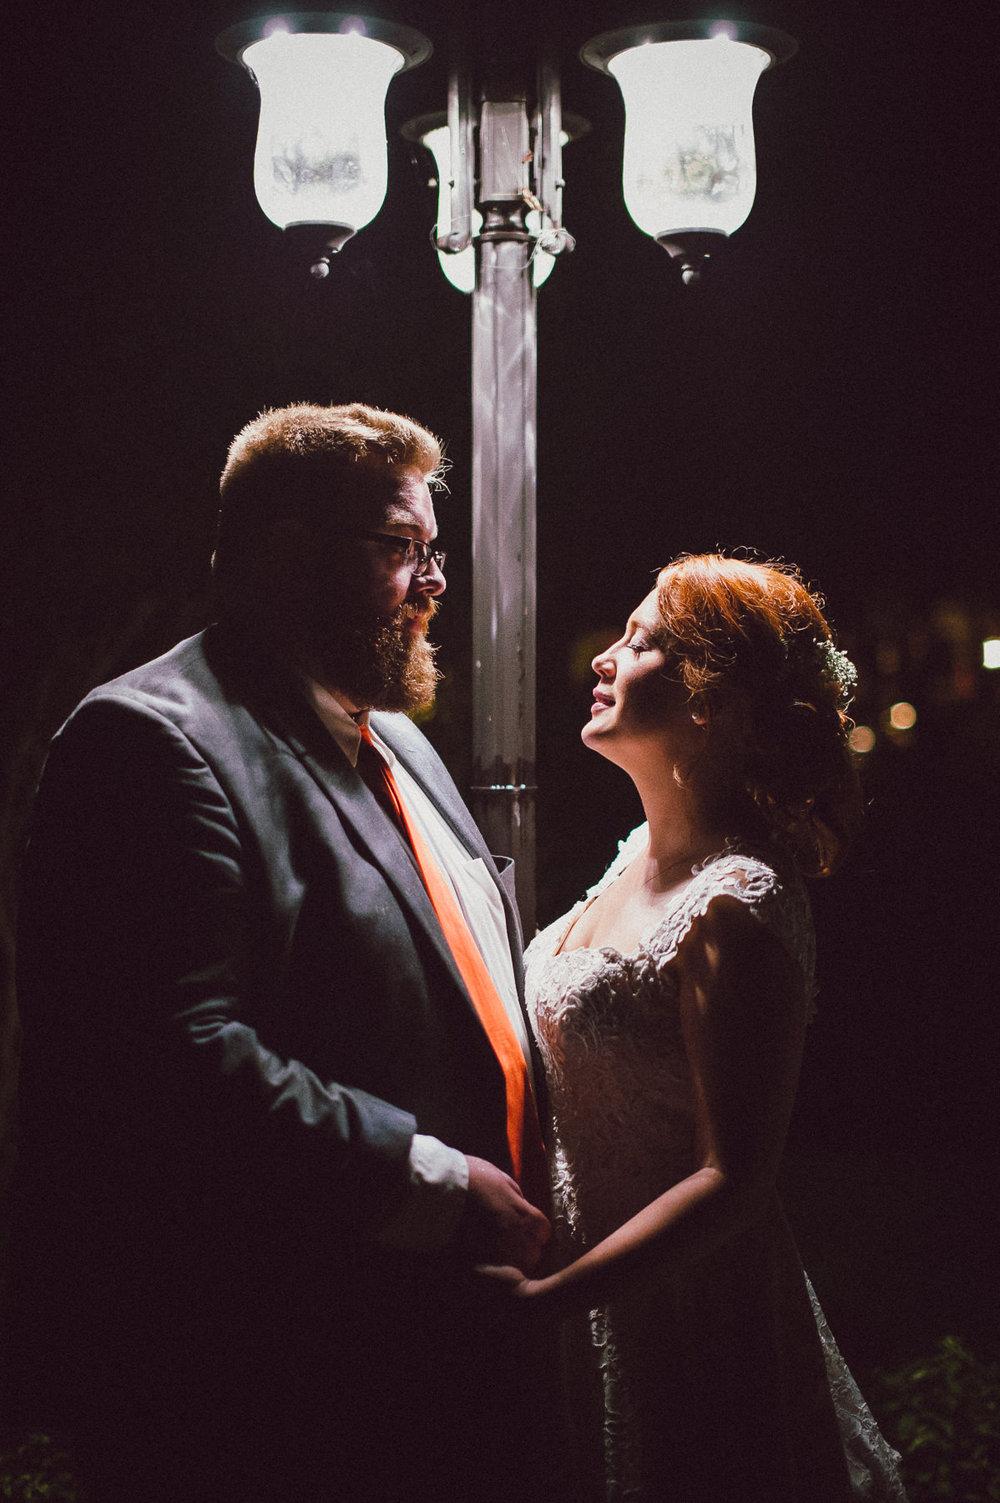 breighton-and-basette-photography-copyrighted-image-blog-amanda-and-eric-wedding-133.jpg